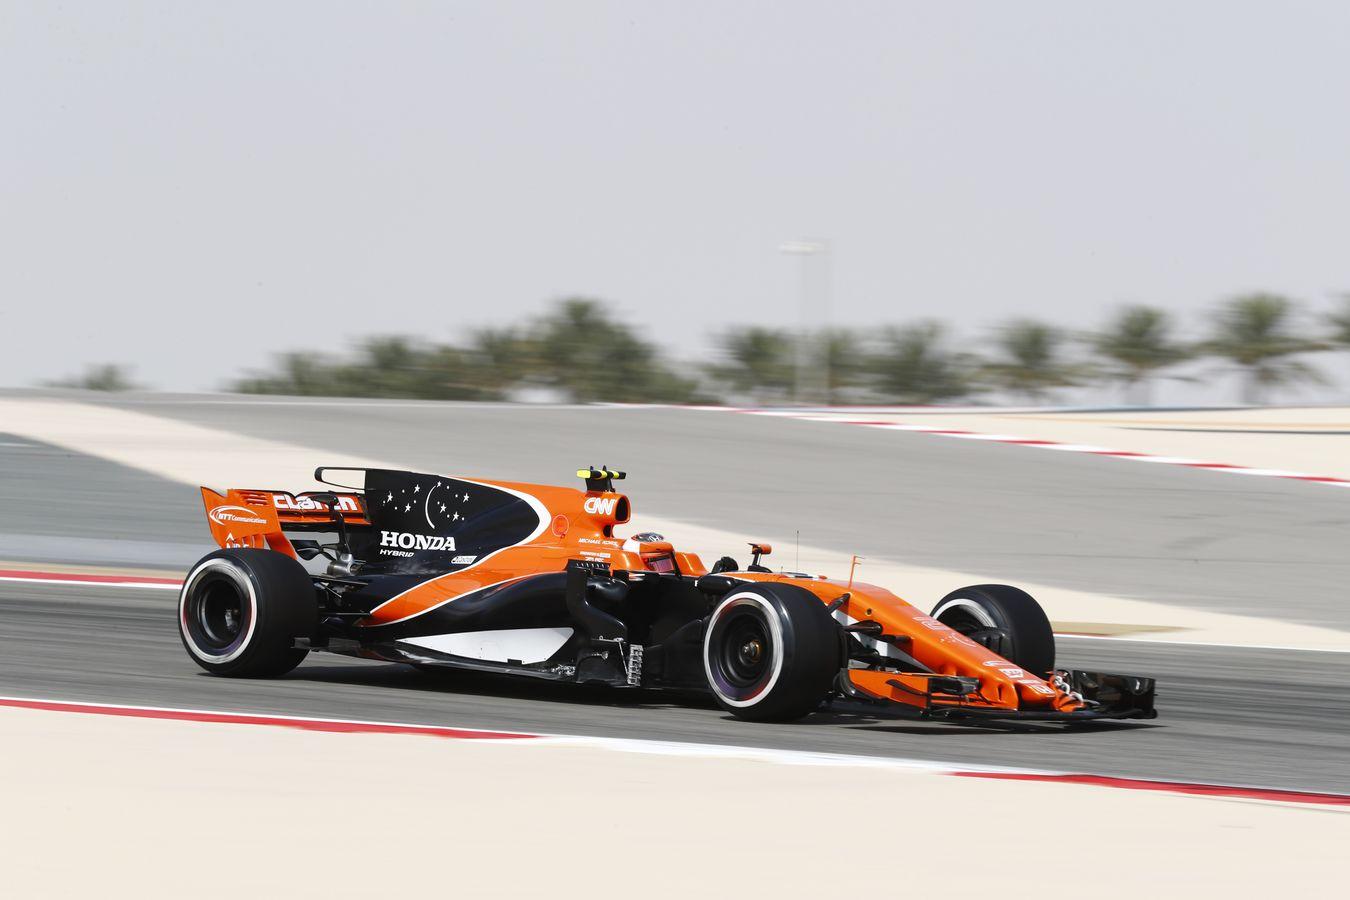 mclaren formula 1 2017 bahrain grand prix free practice